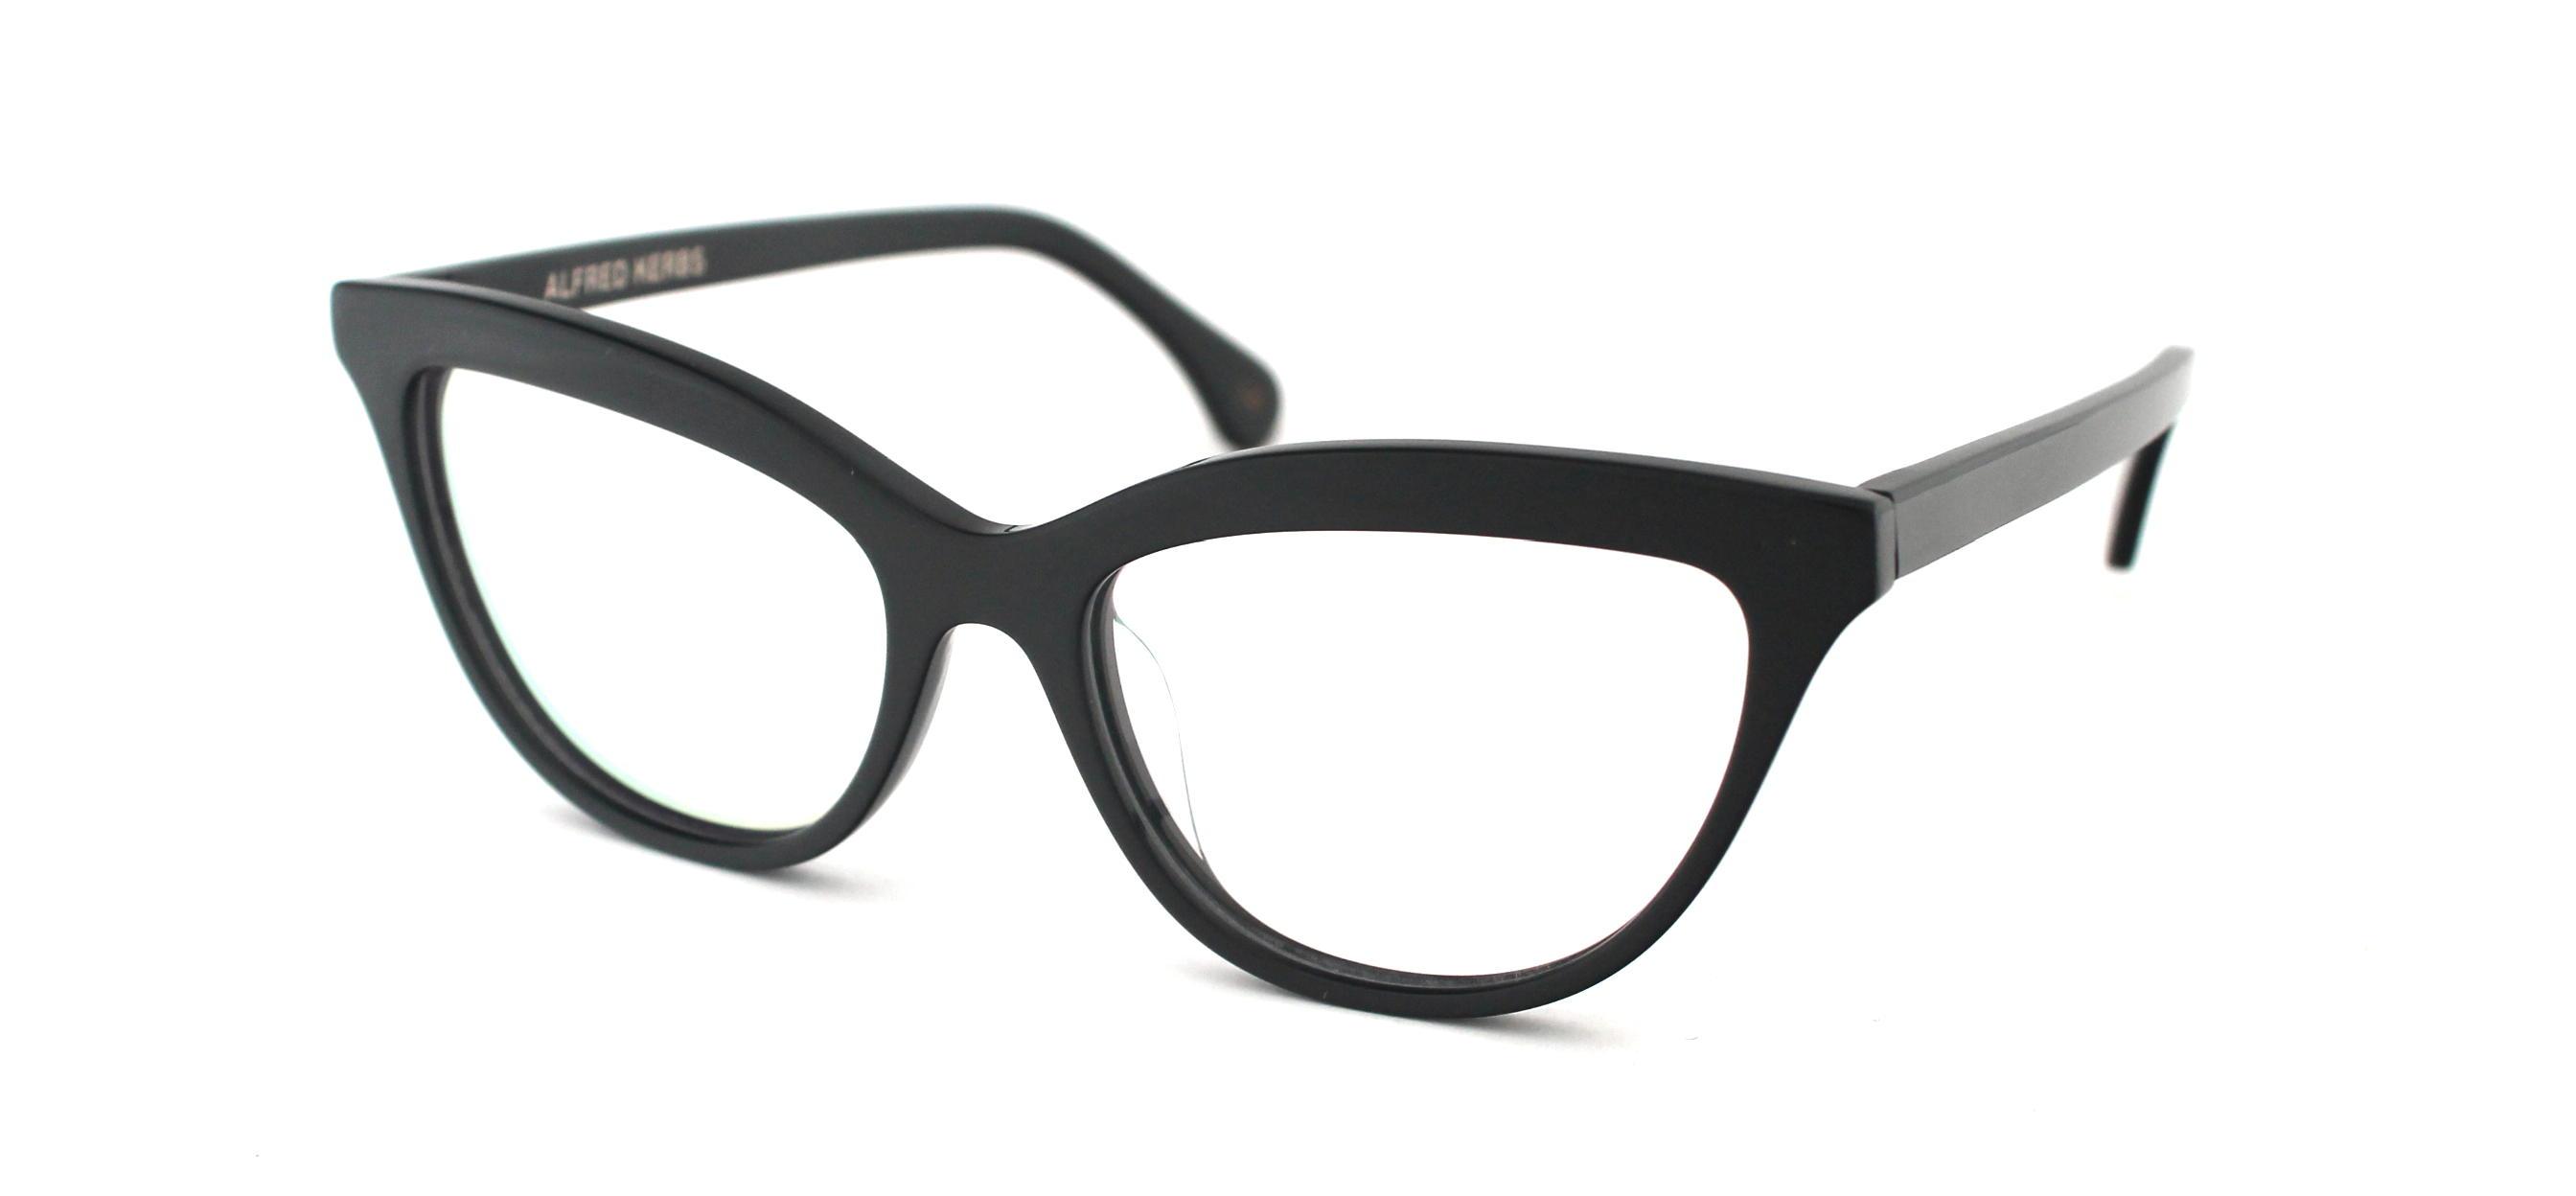 Alfred Kerbs - Deux Optical 01